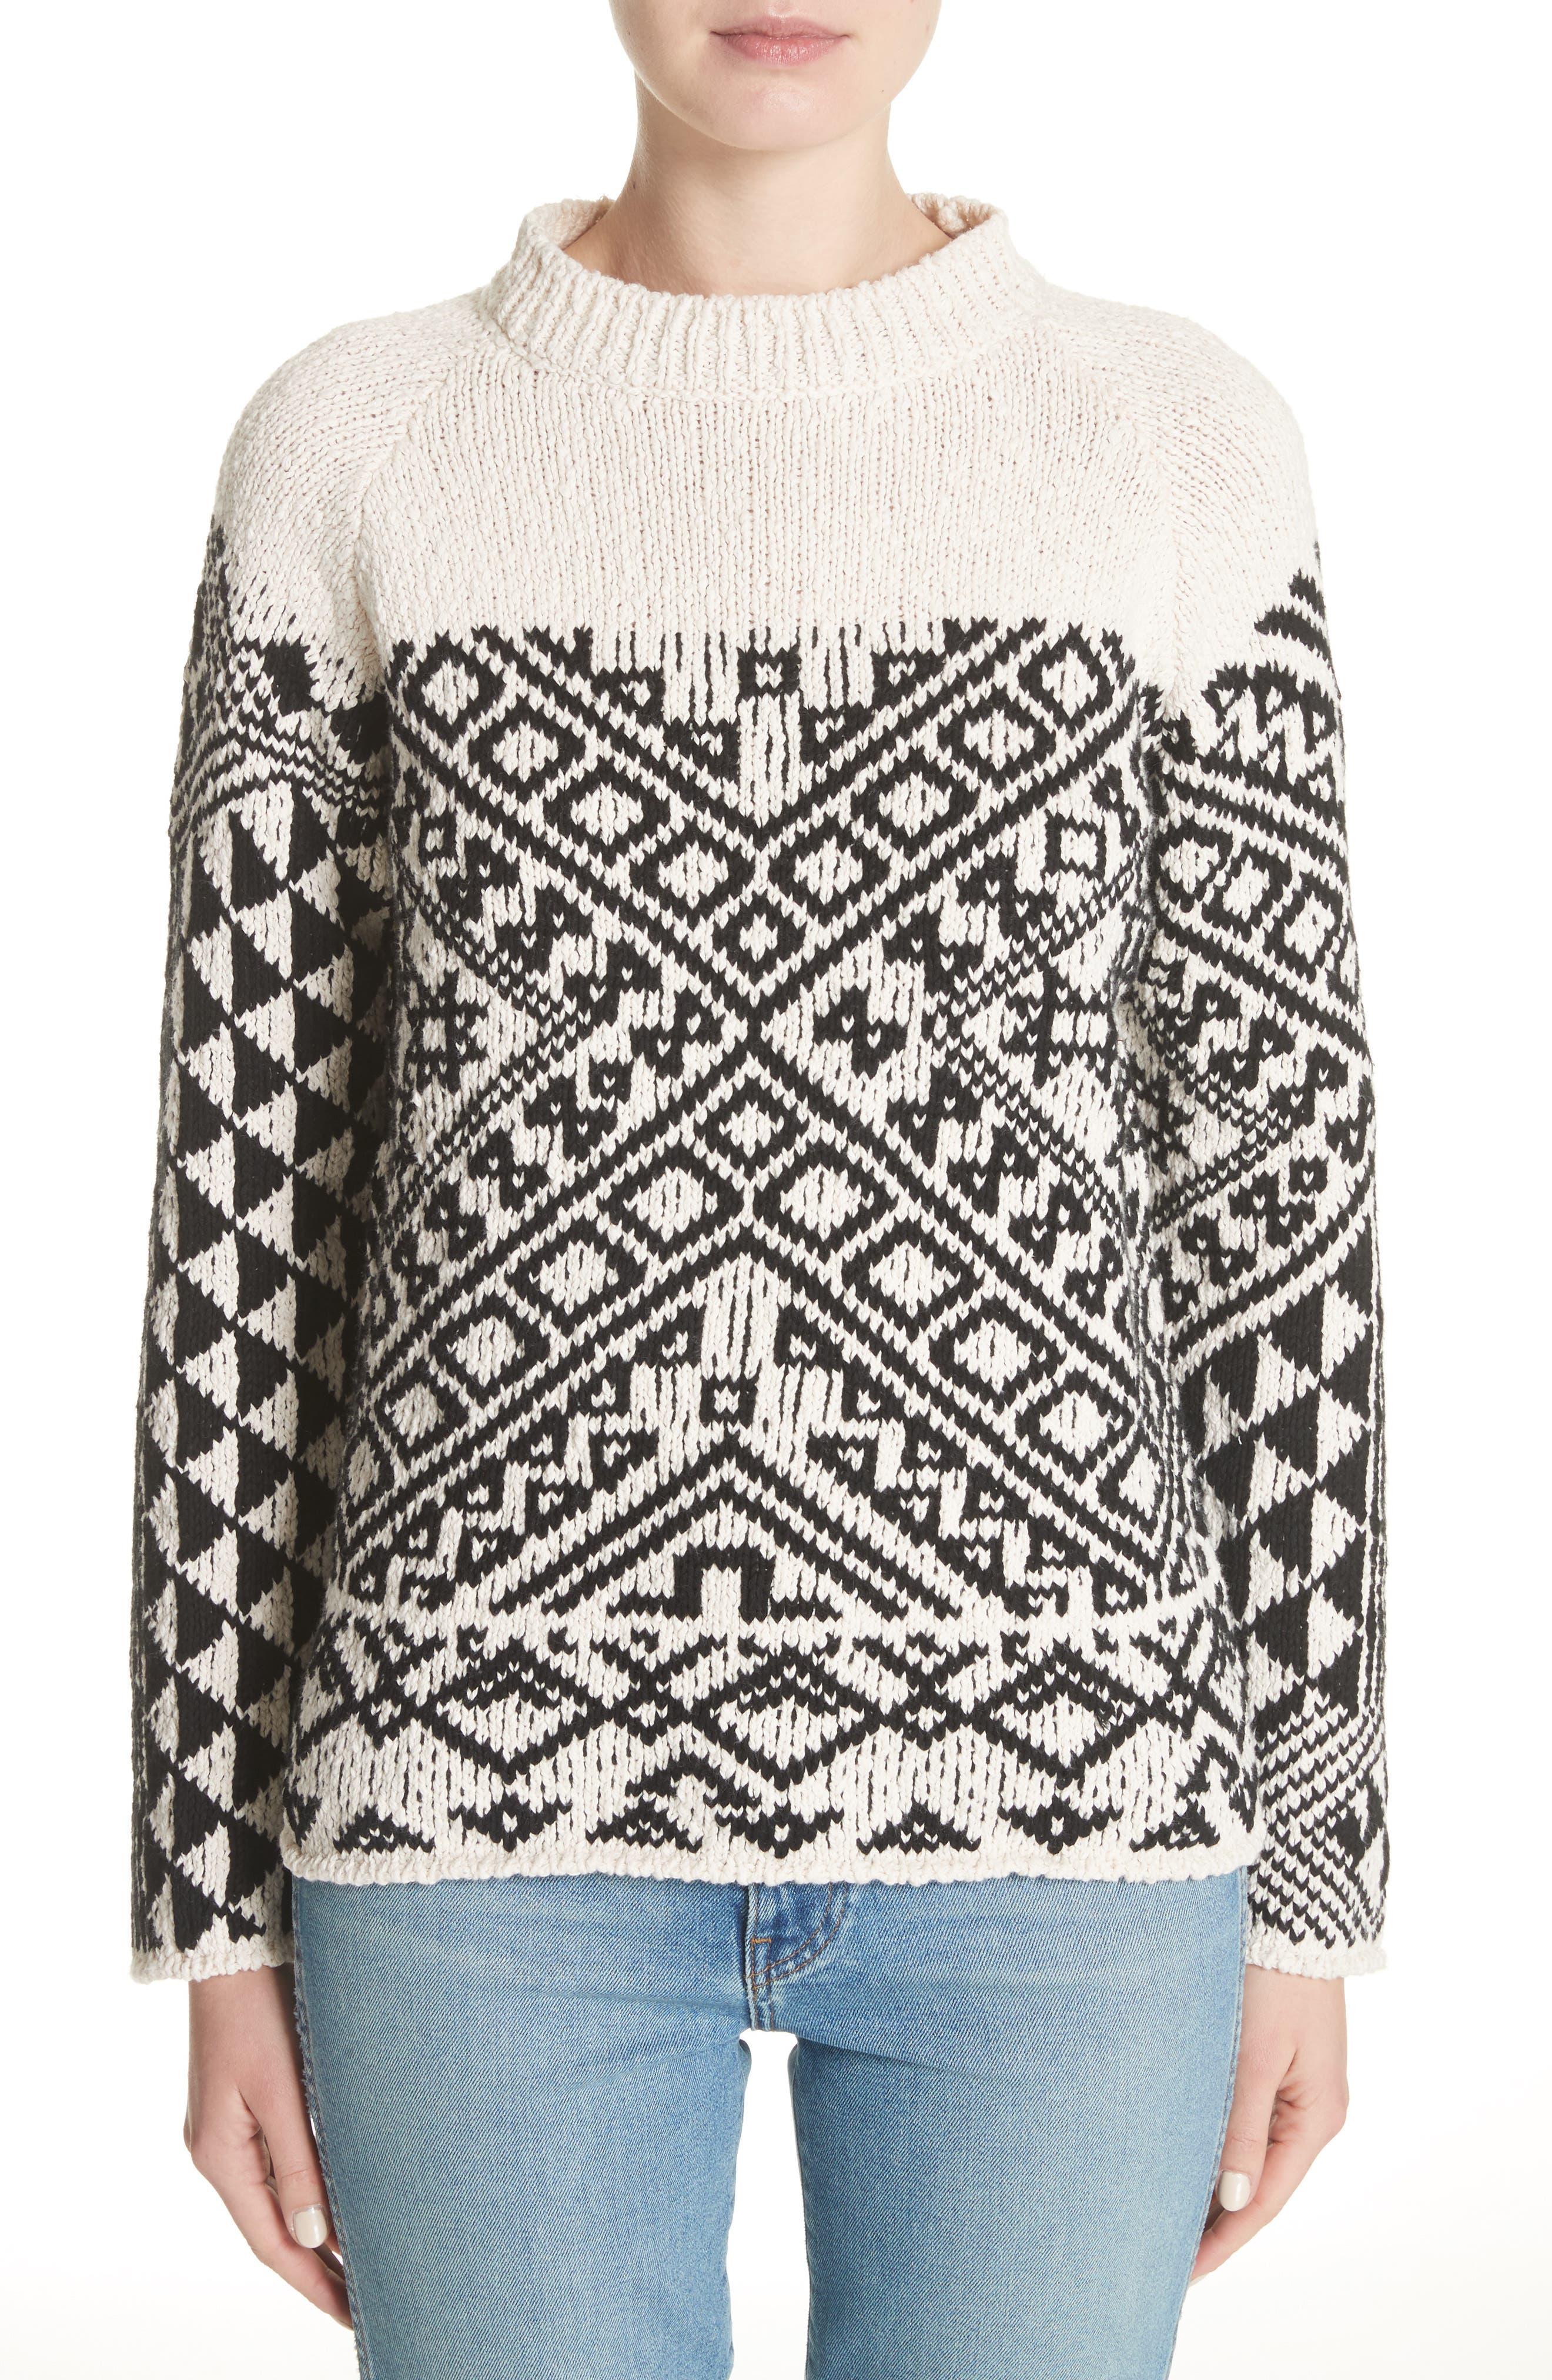 ACNE Studios Rhia Jacquard Sweater